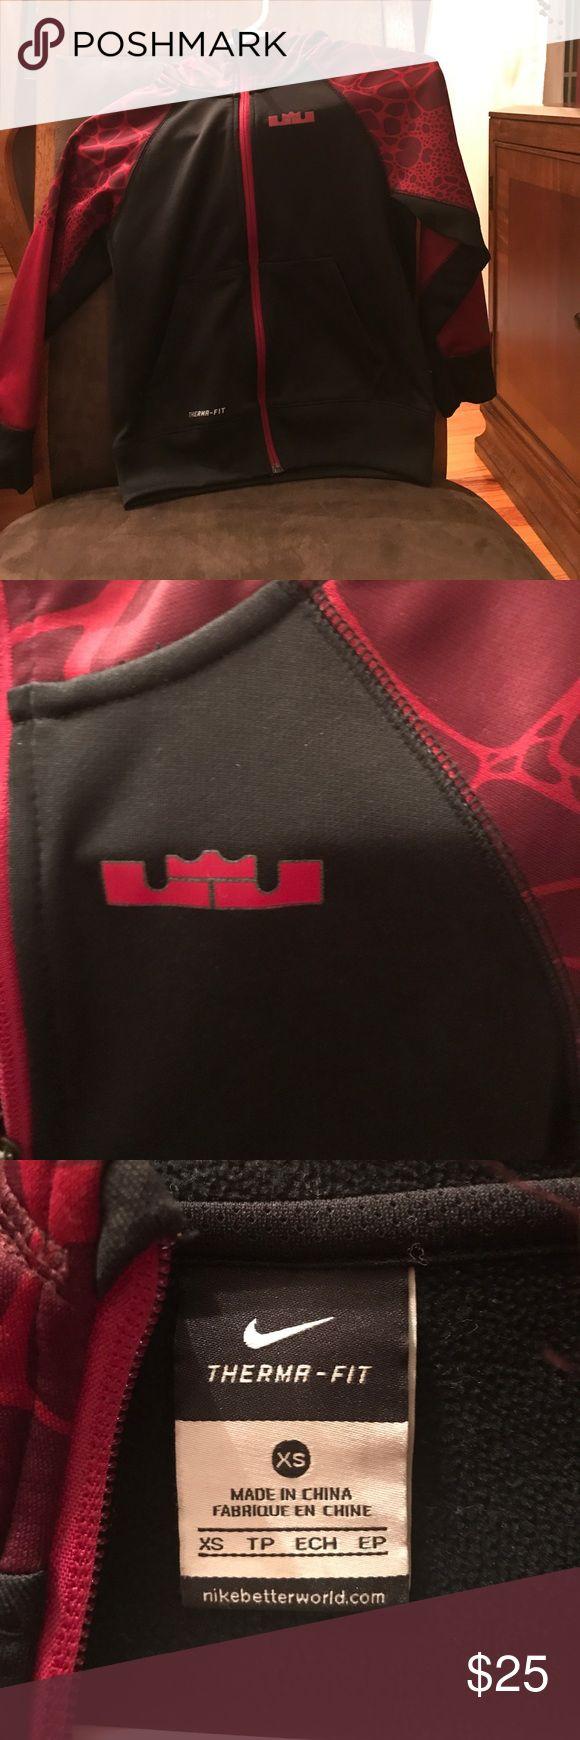 Nike Lebron James Zip Up Hoodie Nike Lebron James Zip Up Hoodie • Boys XS • Good Condition Nike Shirts & Tops Sweatshirts & Hoodies